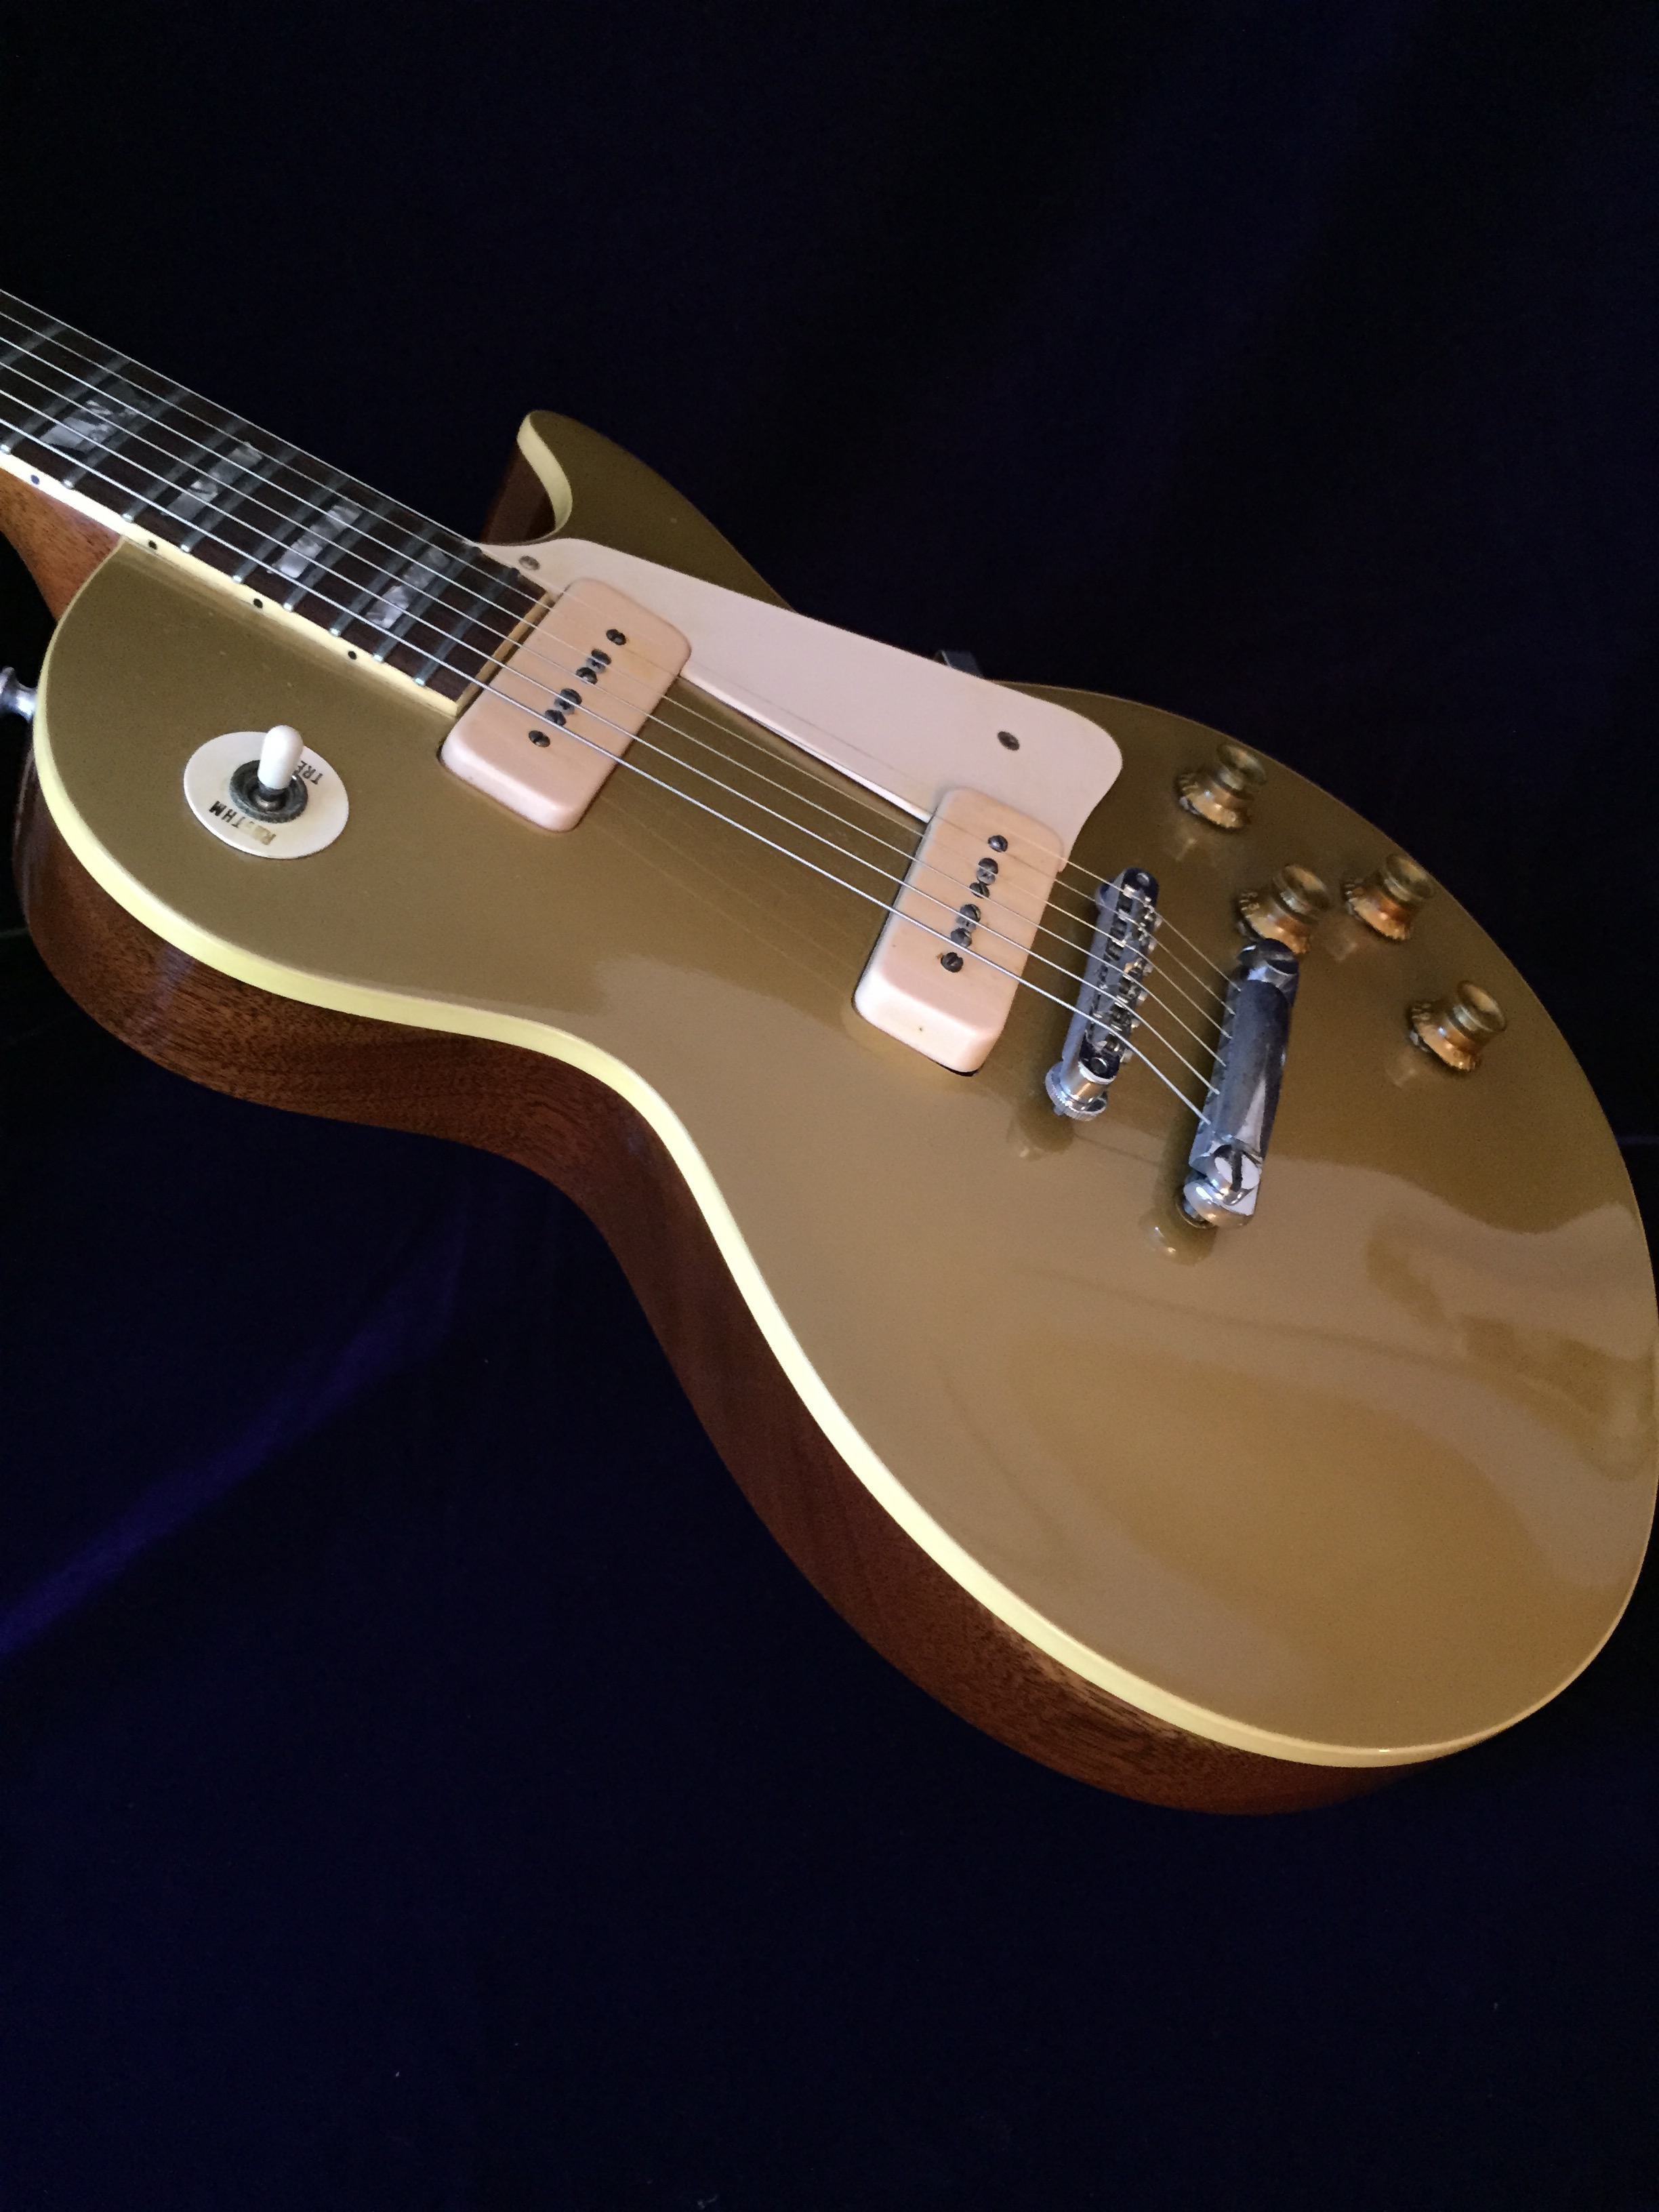 Vintage Gibson Wiring Two P90 Trusted Diagram Es 330 Plectrum Nyc 69 Les Paul Standard Goldtop P 90 Pickup